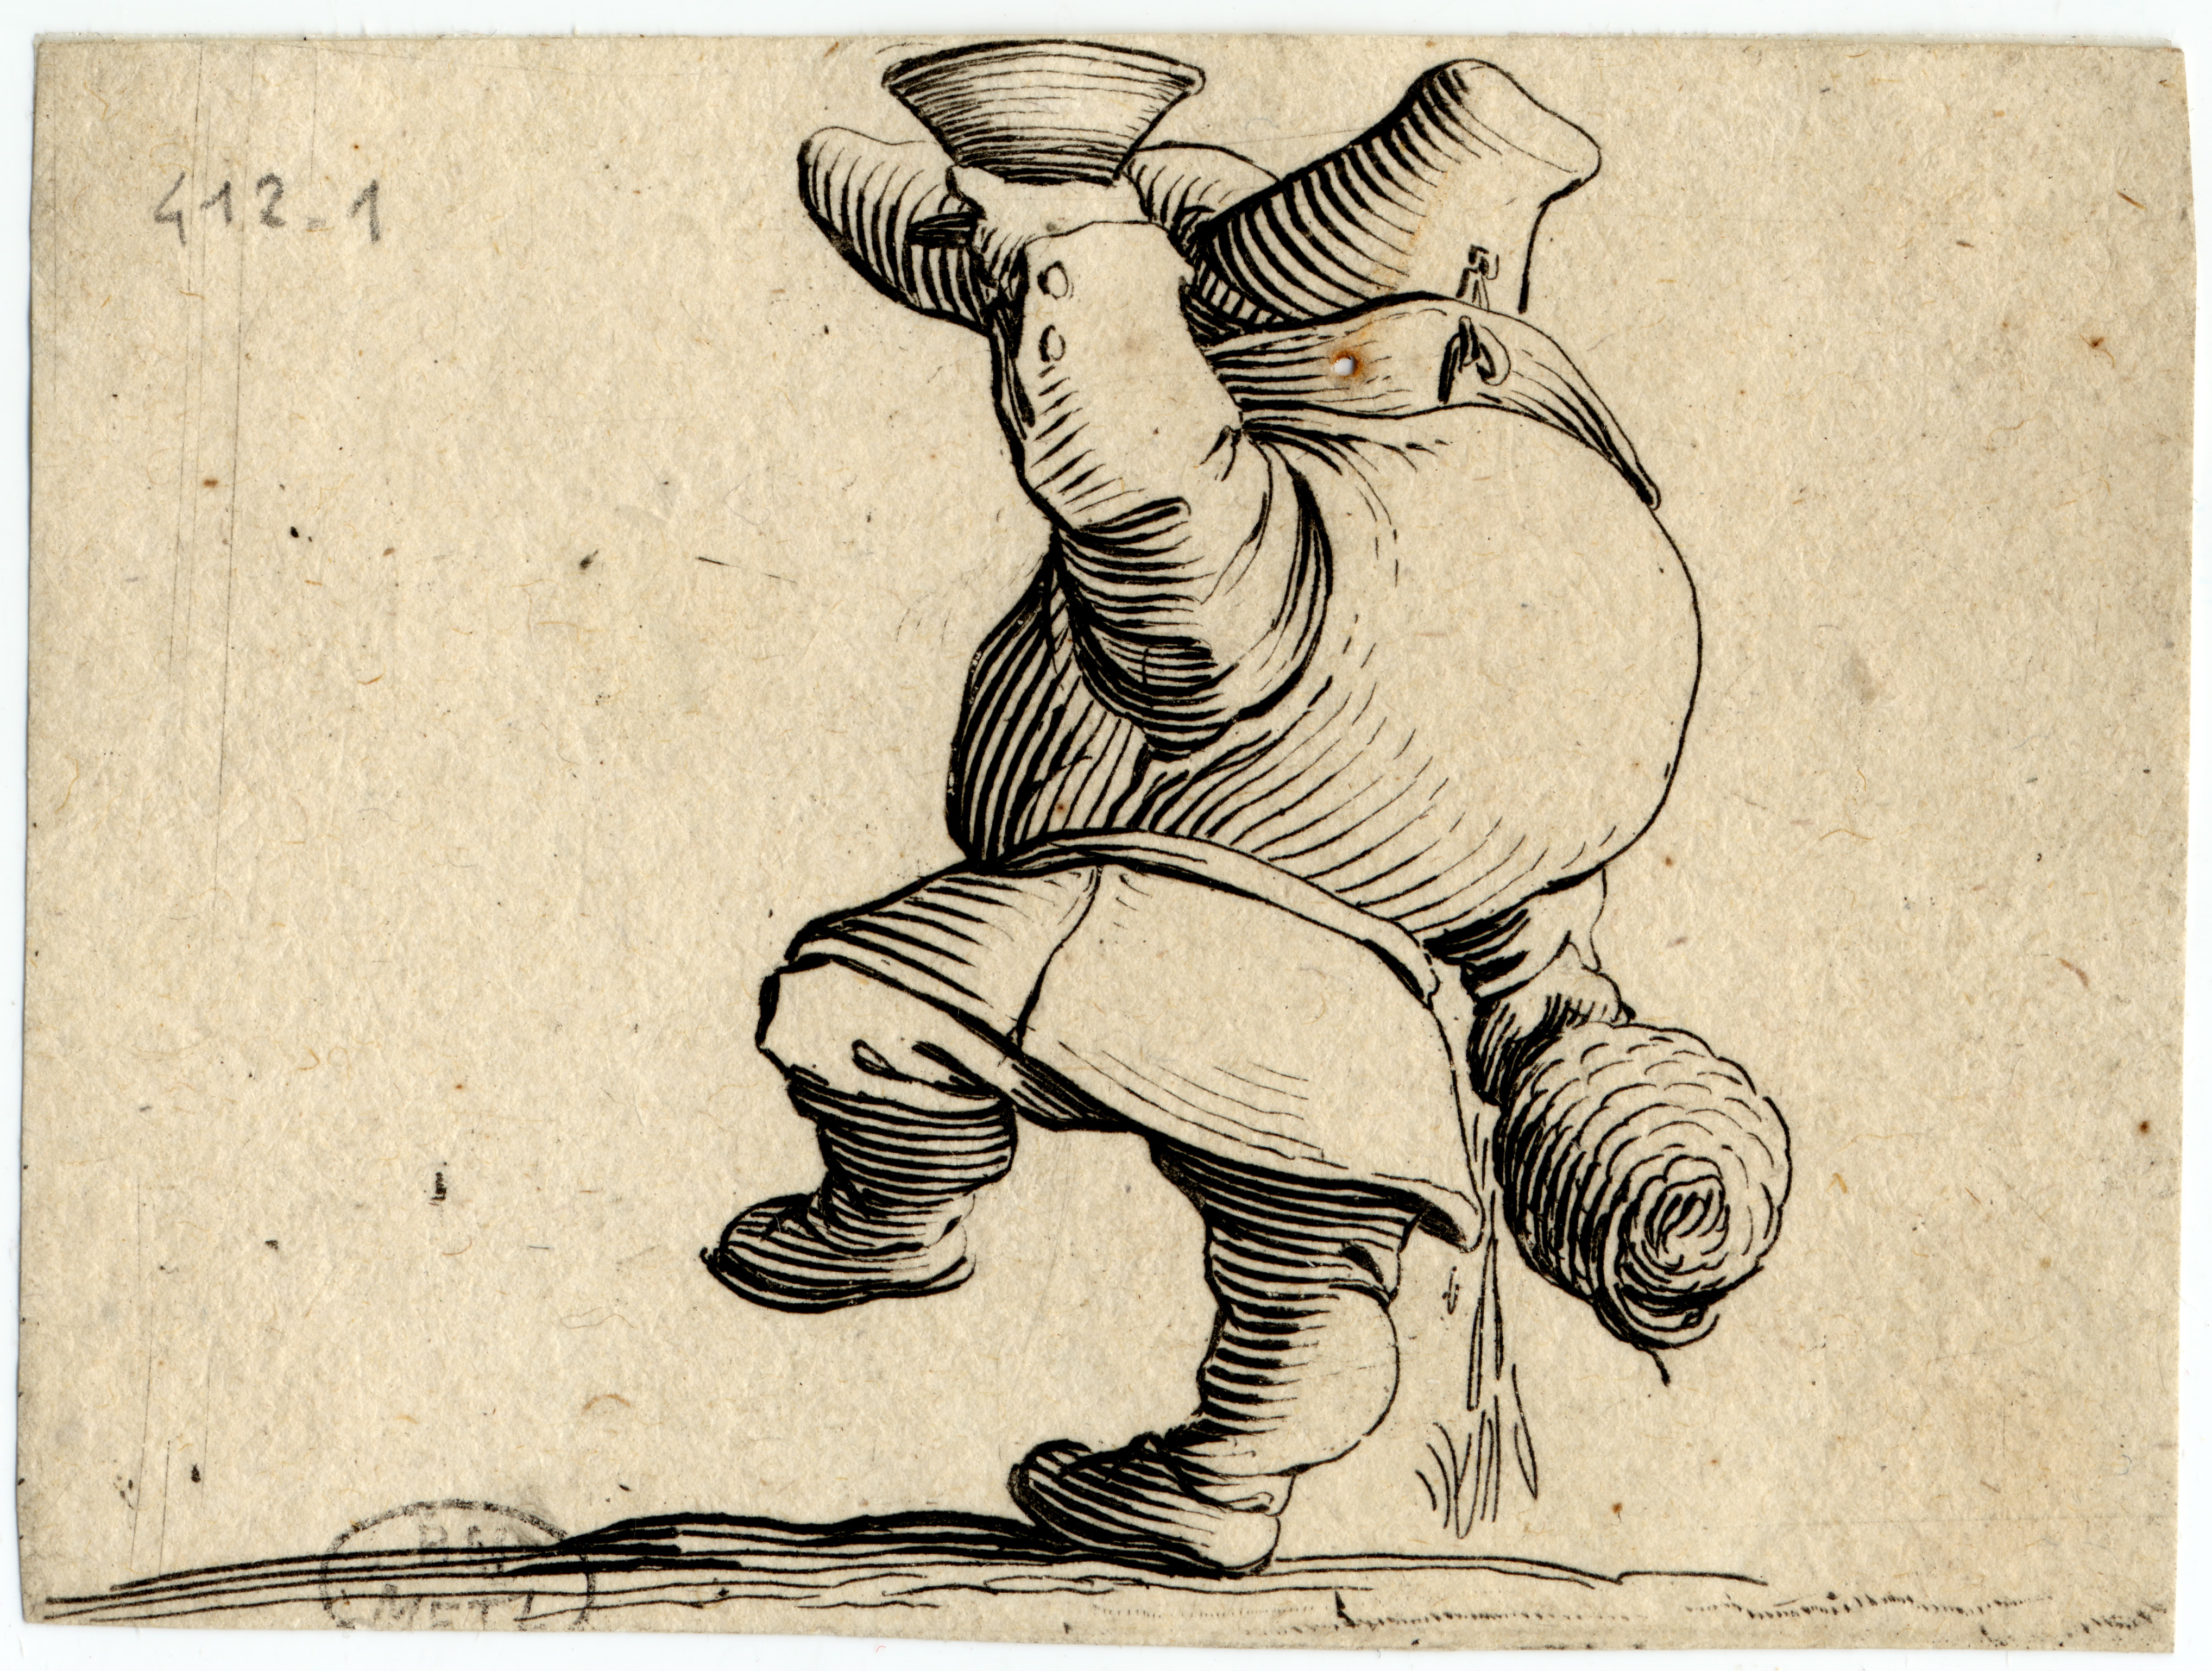 Contenu du Les Gobbi: Le buveur vu de dos